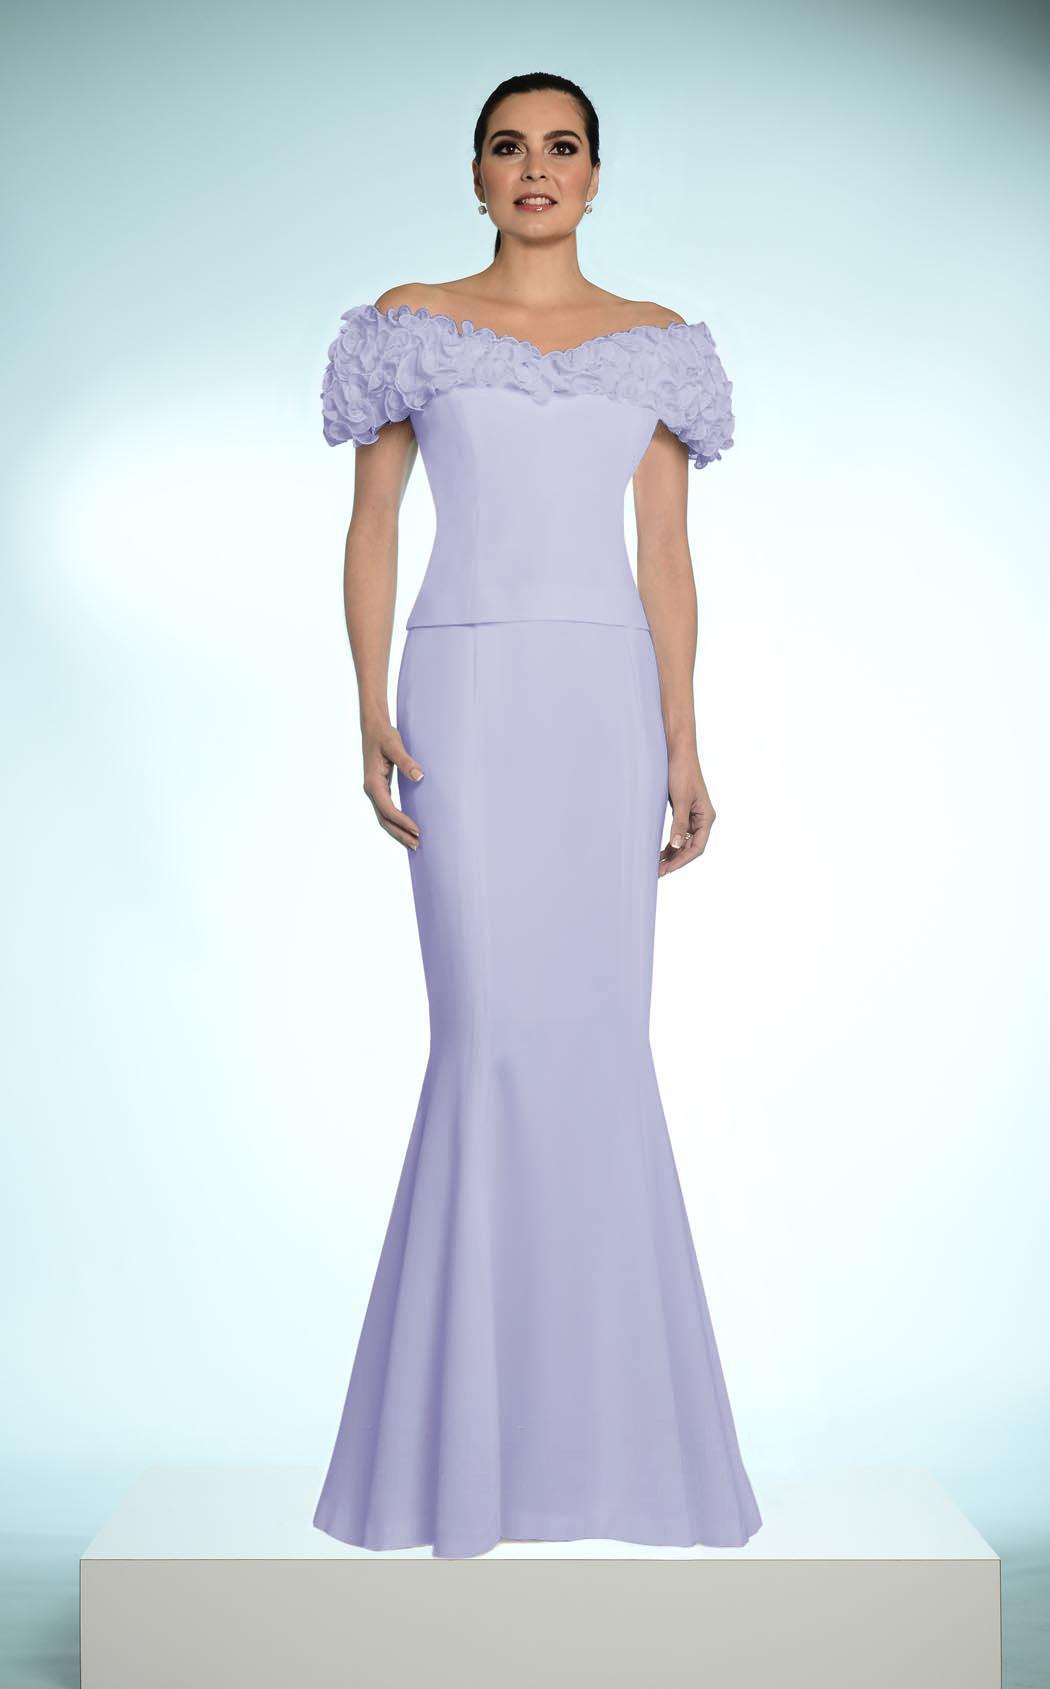 Daymor Couture - 2003 Rosette Ruffles Off Shoulder Evening Dress